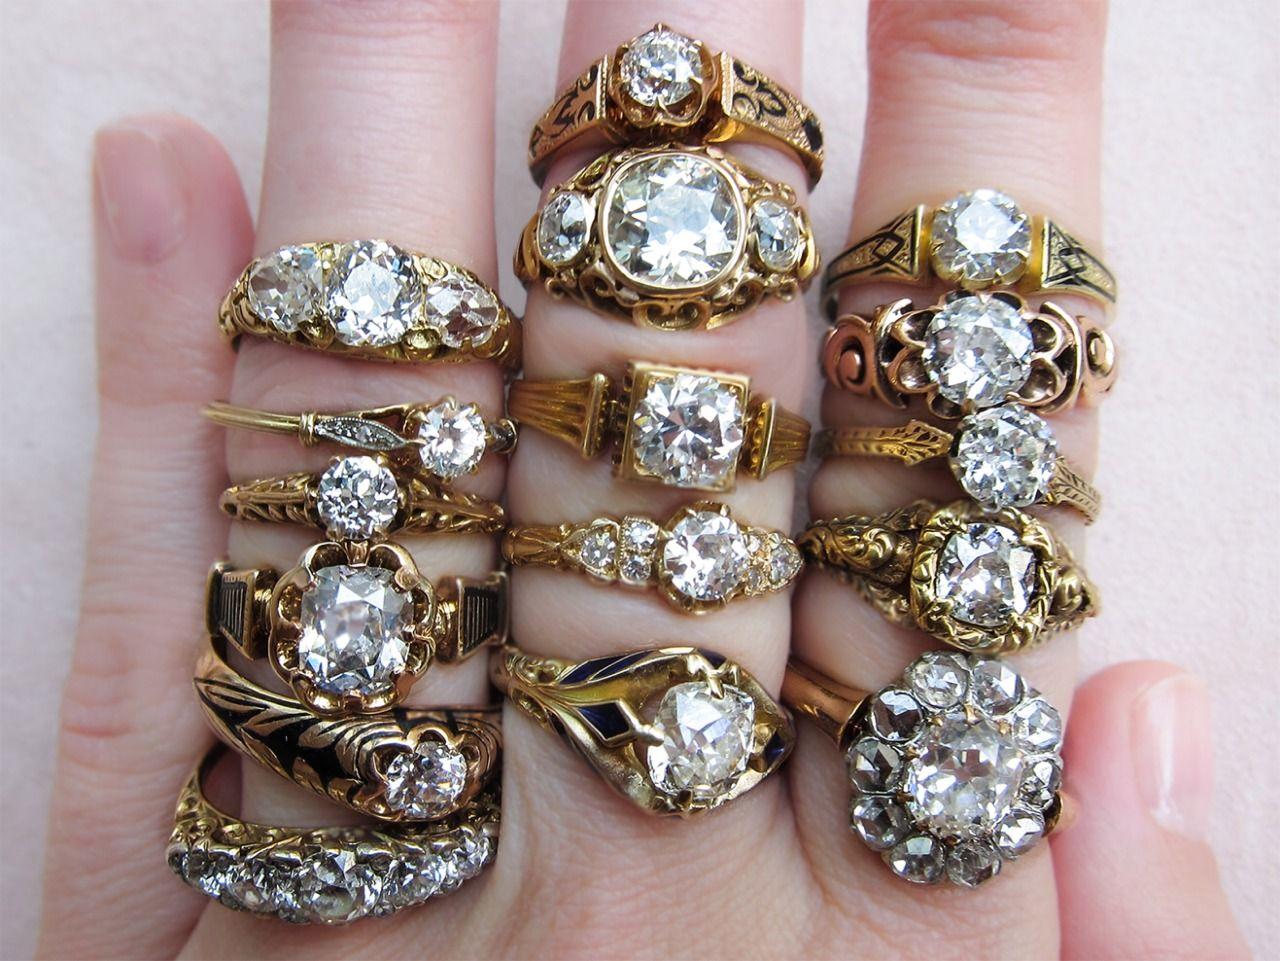 E R S T W H I L E — Antique Victorian engagement rings